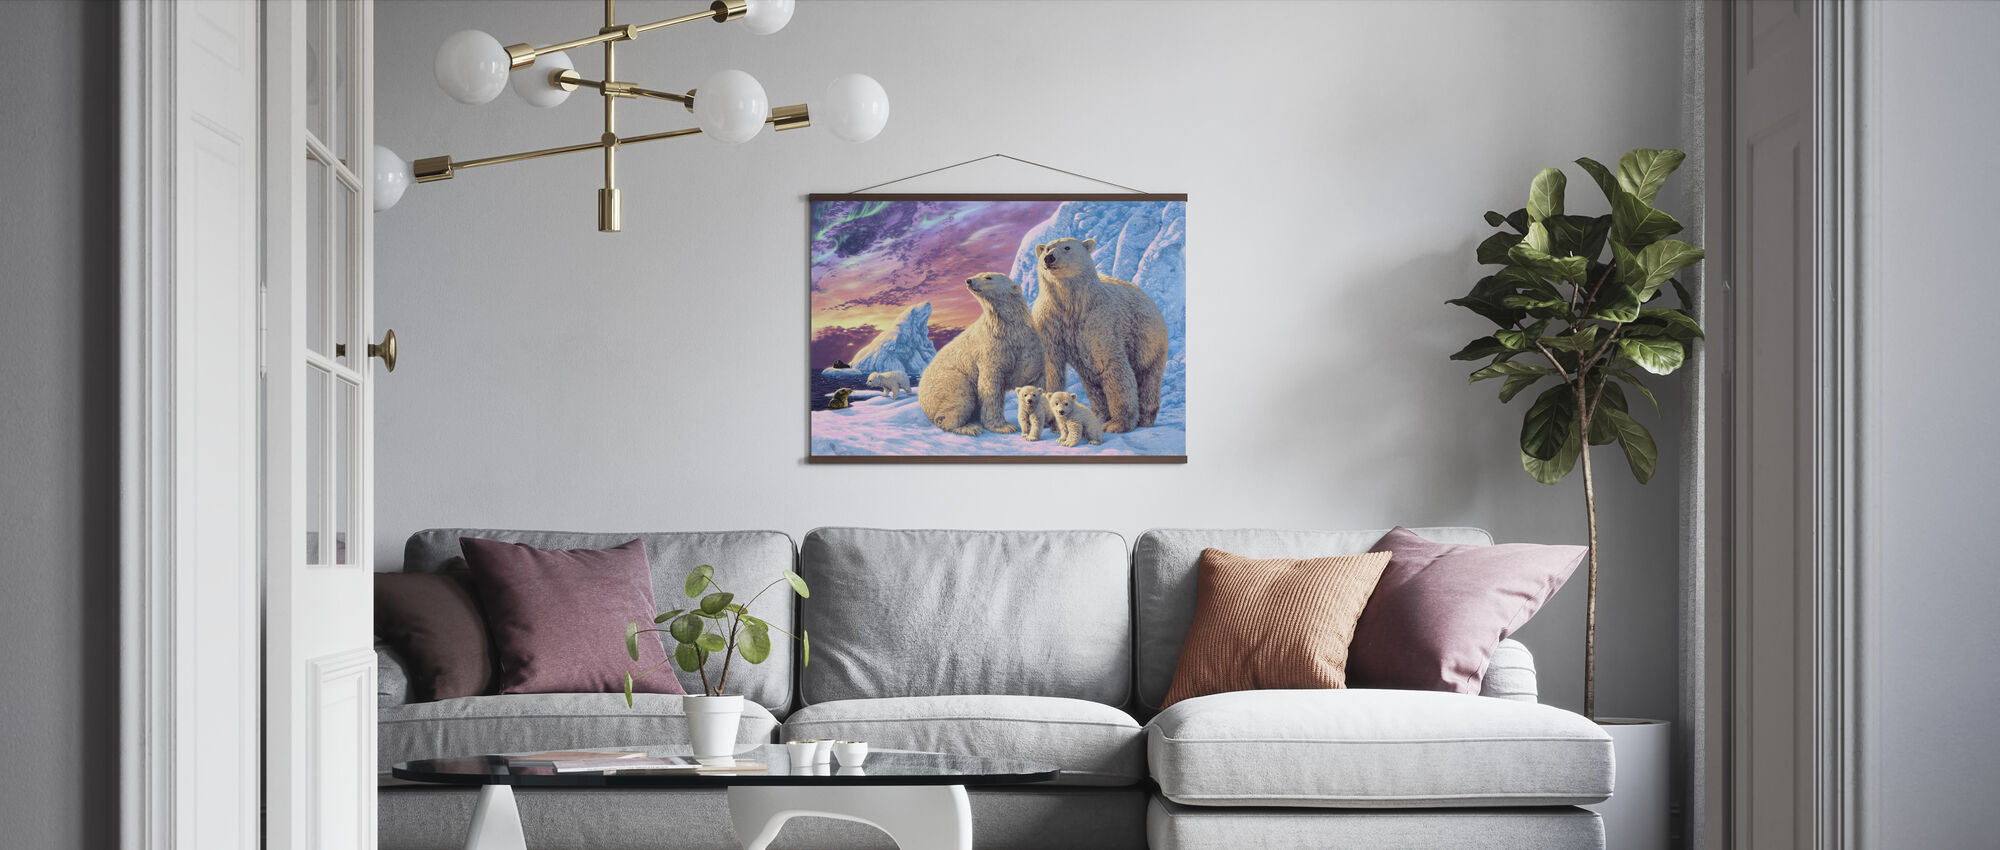 Isbjørn - Plakat - Stue